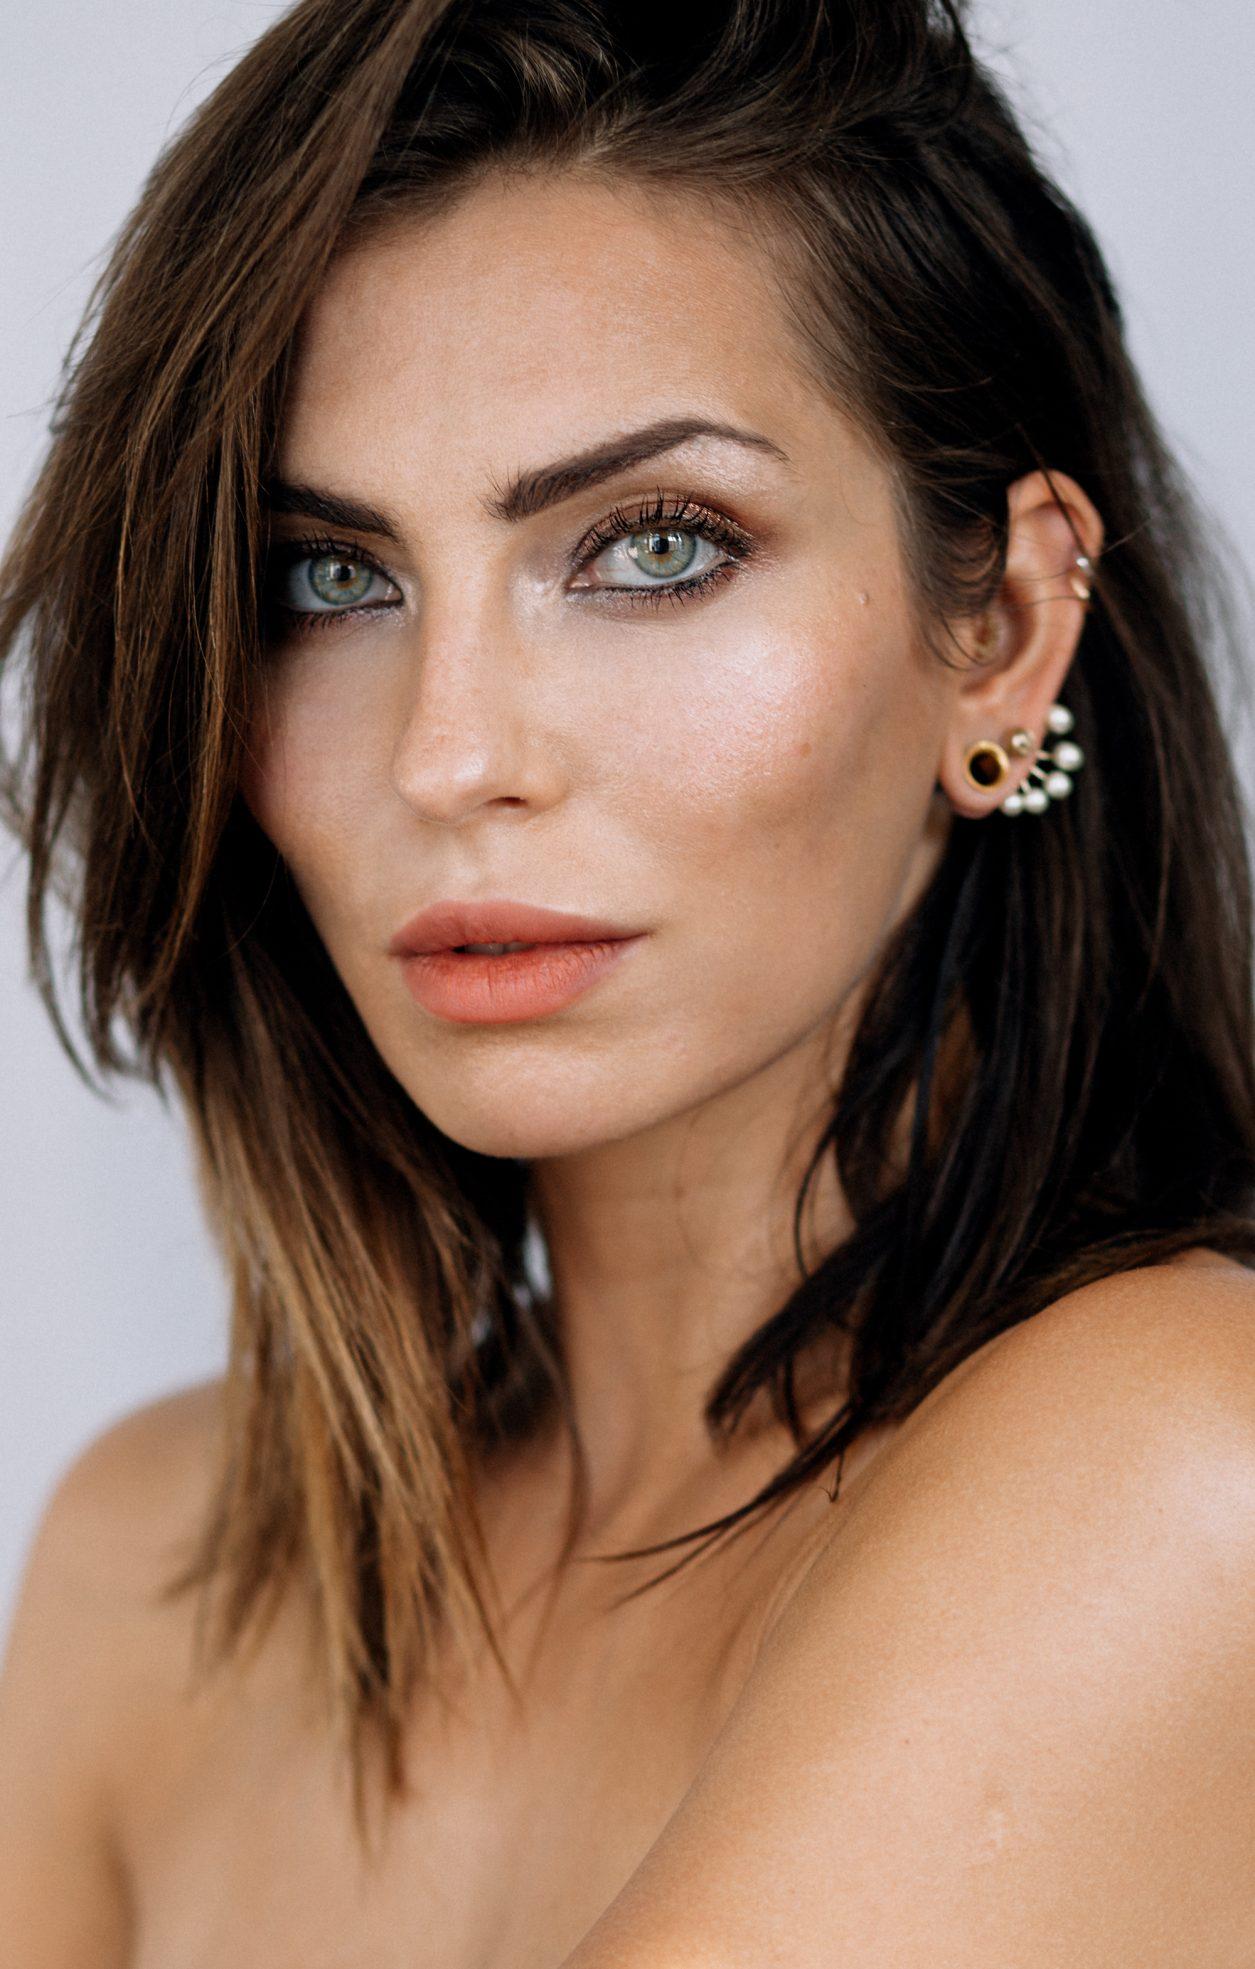 Masha Sedgwick | Portrait | Press Picture | longbob | makeup hair and beauty inspo | inspiration